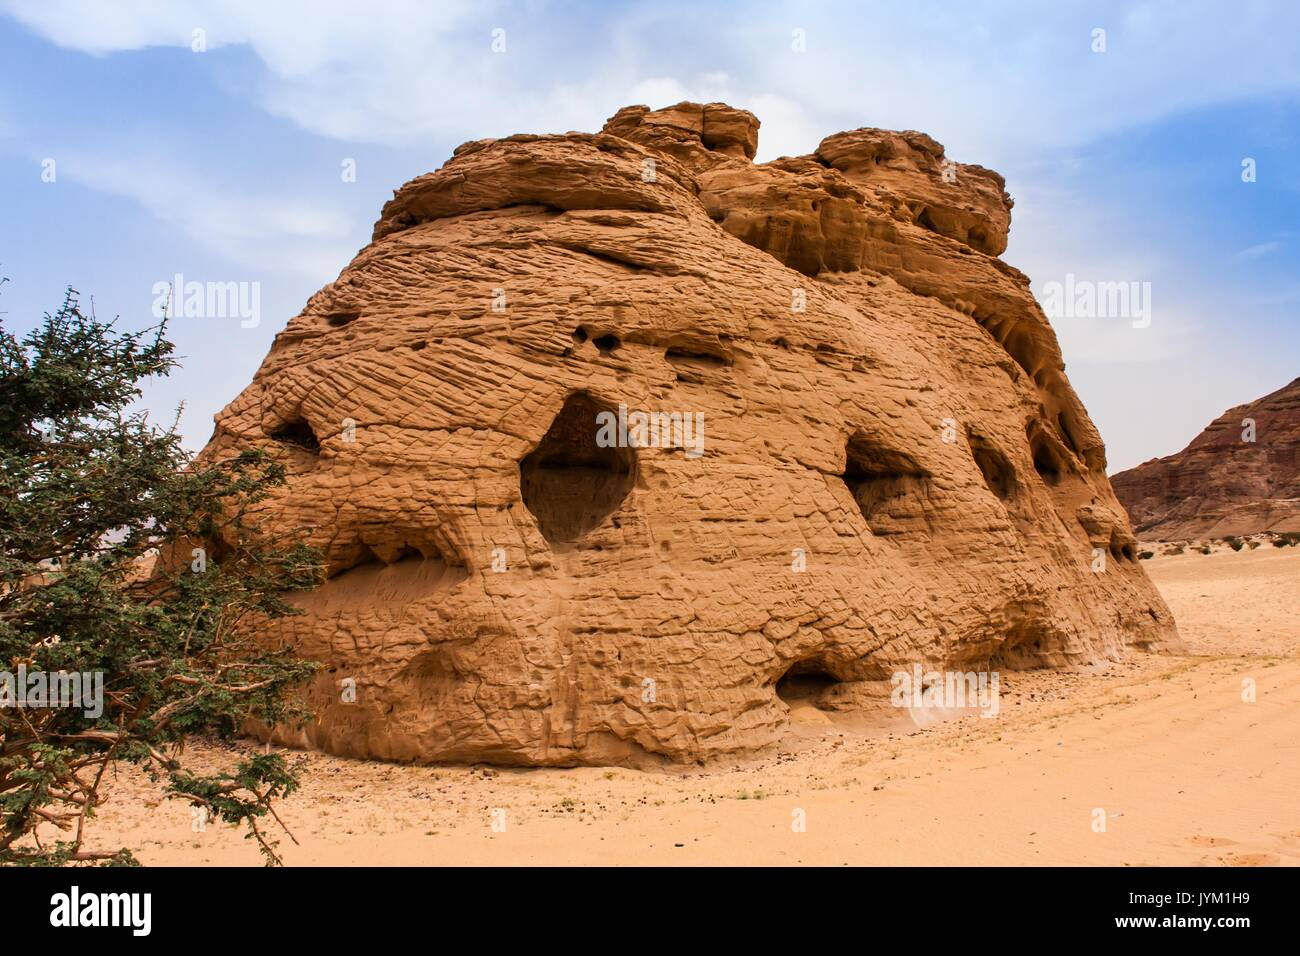 Cattedrale di pietra, Riyadh Provincia Immagini Stock